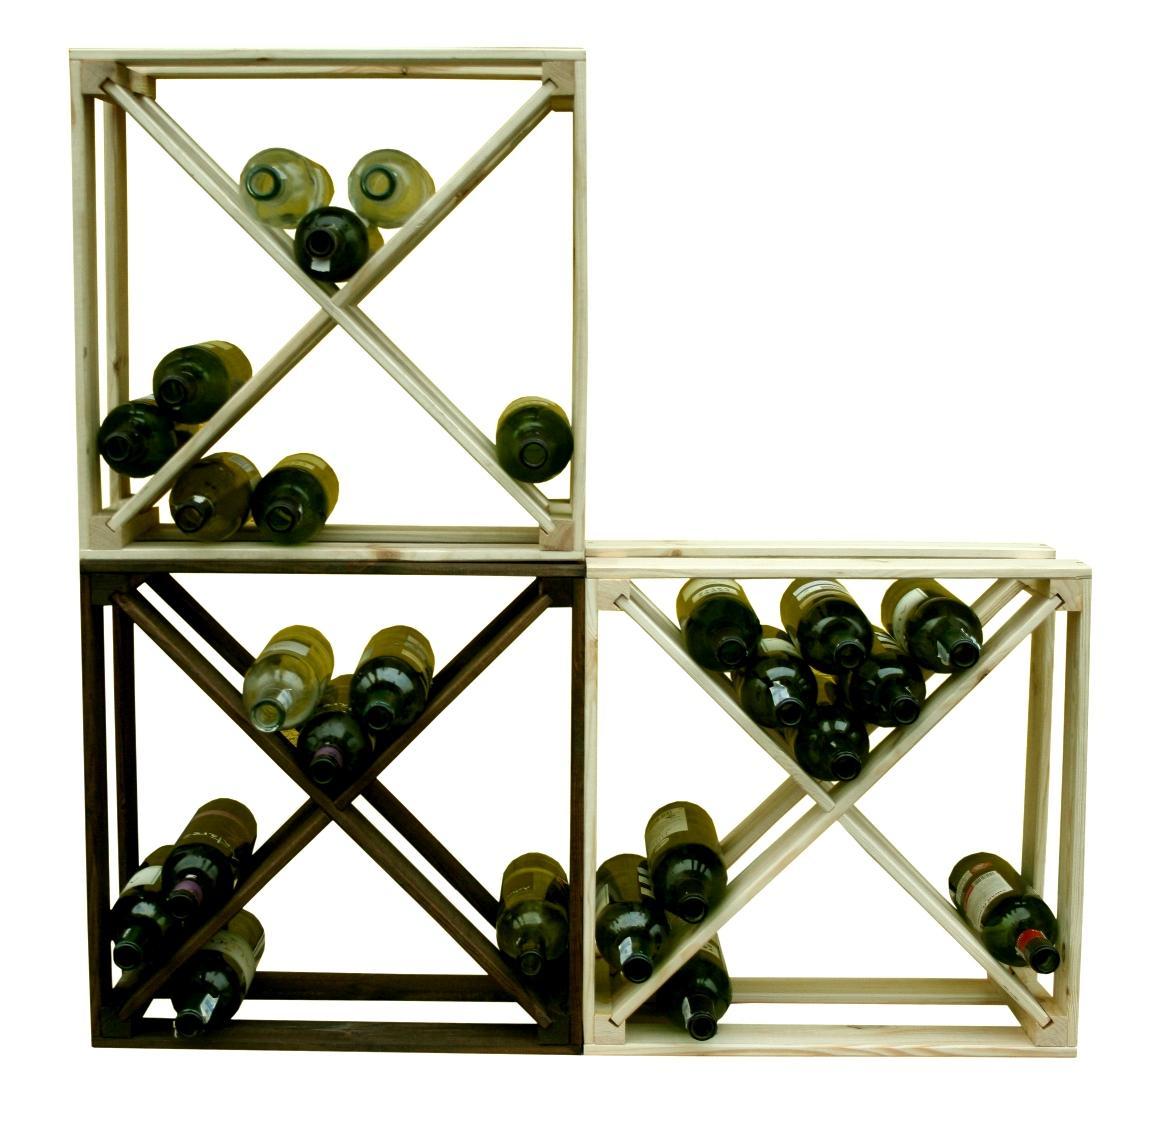 cave vin meubles en kit assembler 10 0 1000 0 pi ces par mois. Black Bedroom Furniture Sets. Home Design Ideas